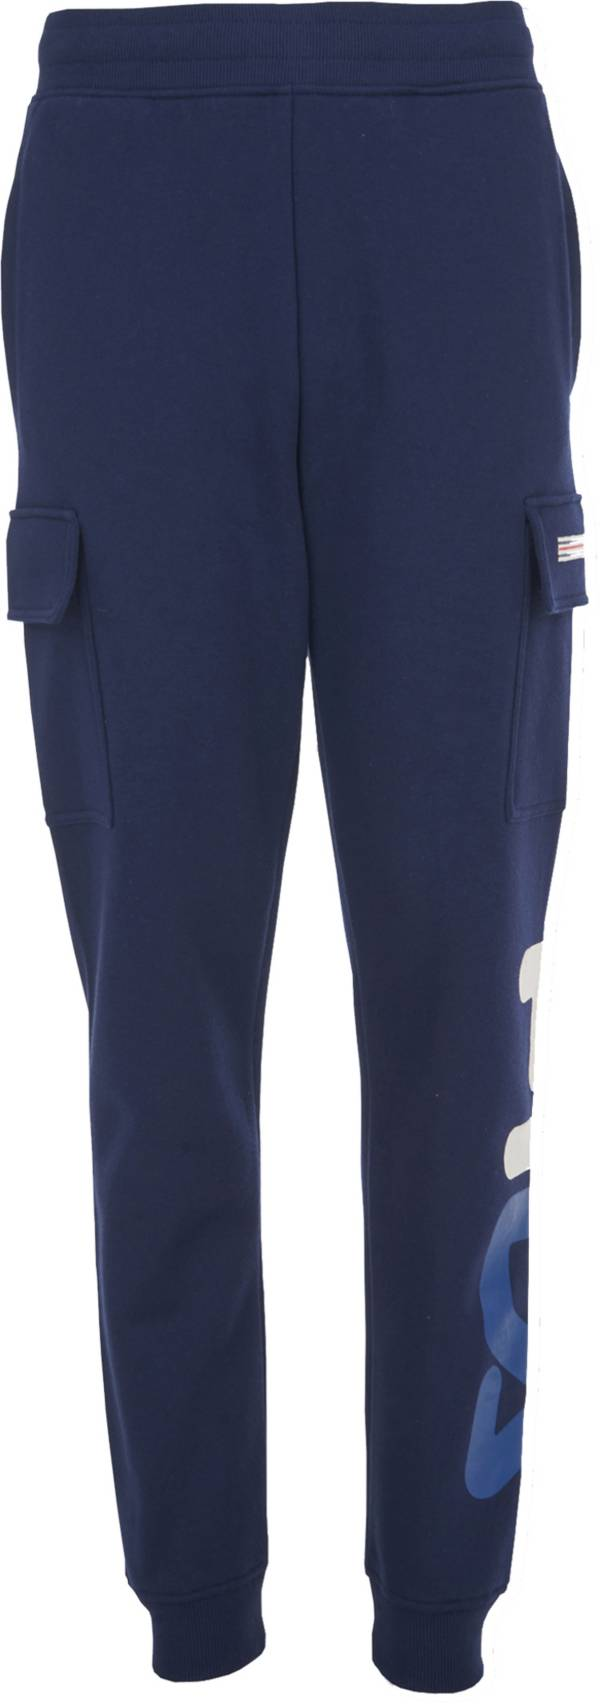 FILA Boys' Ethan Cargo Jogger Pants product image